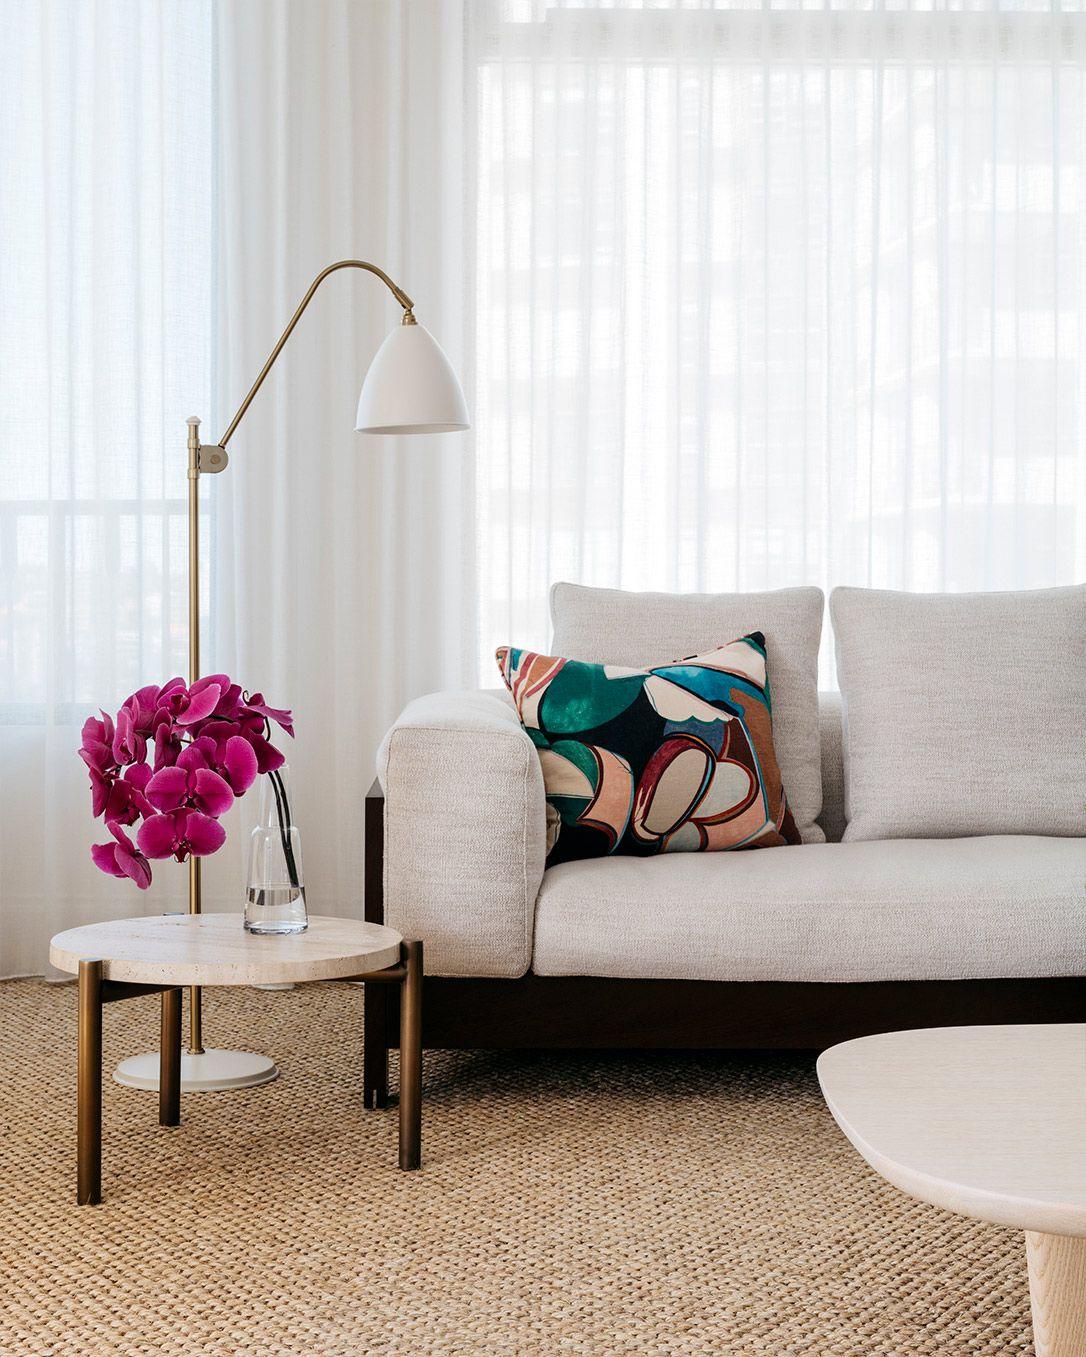 50 fresh spring decorating ideas spring decorations inspiration rh housebeautiful com